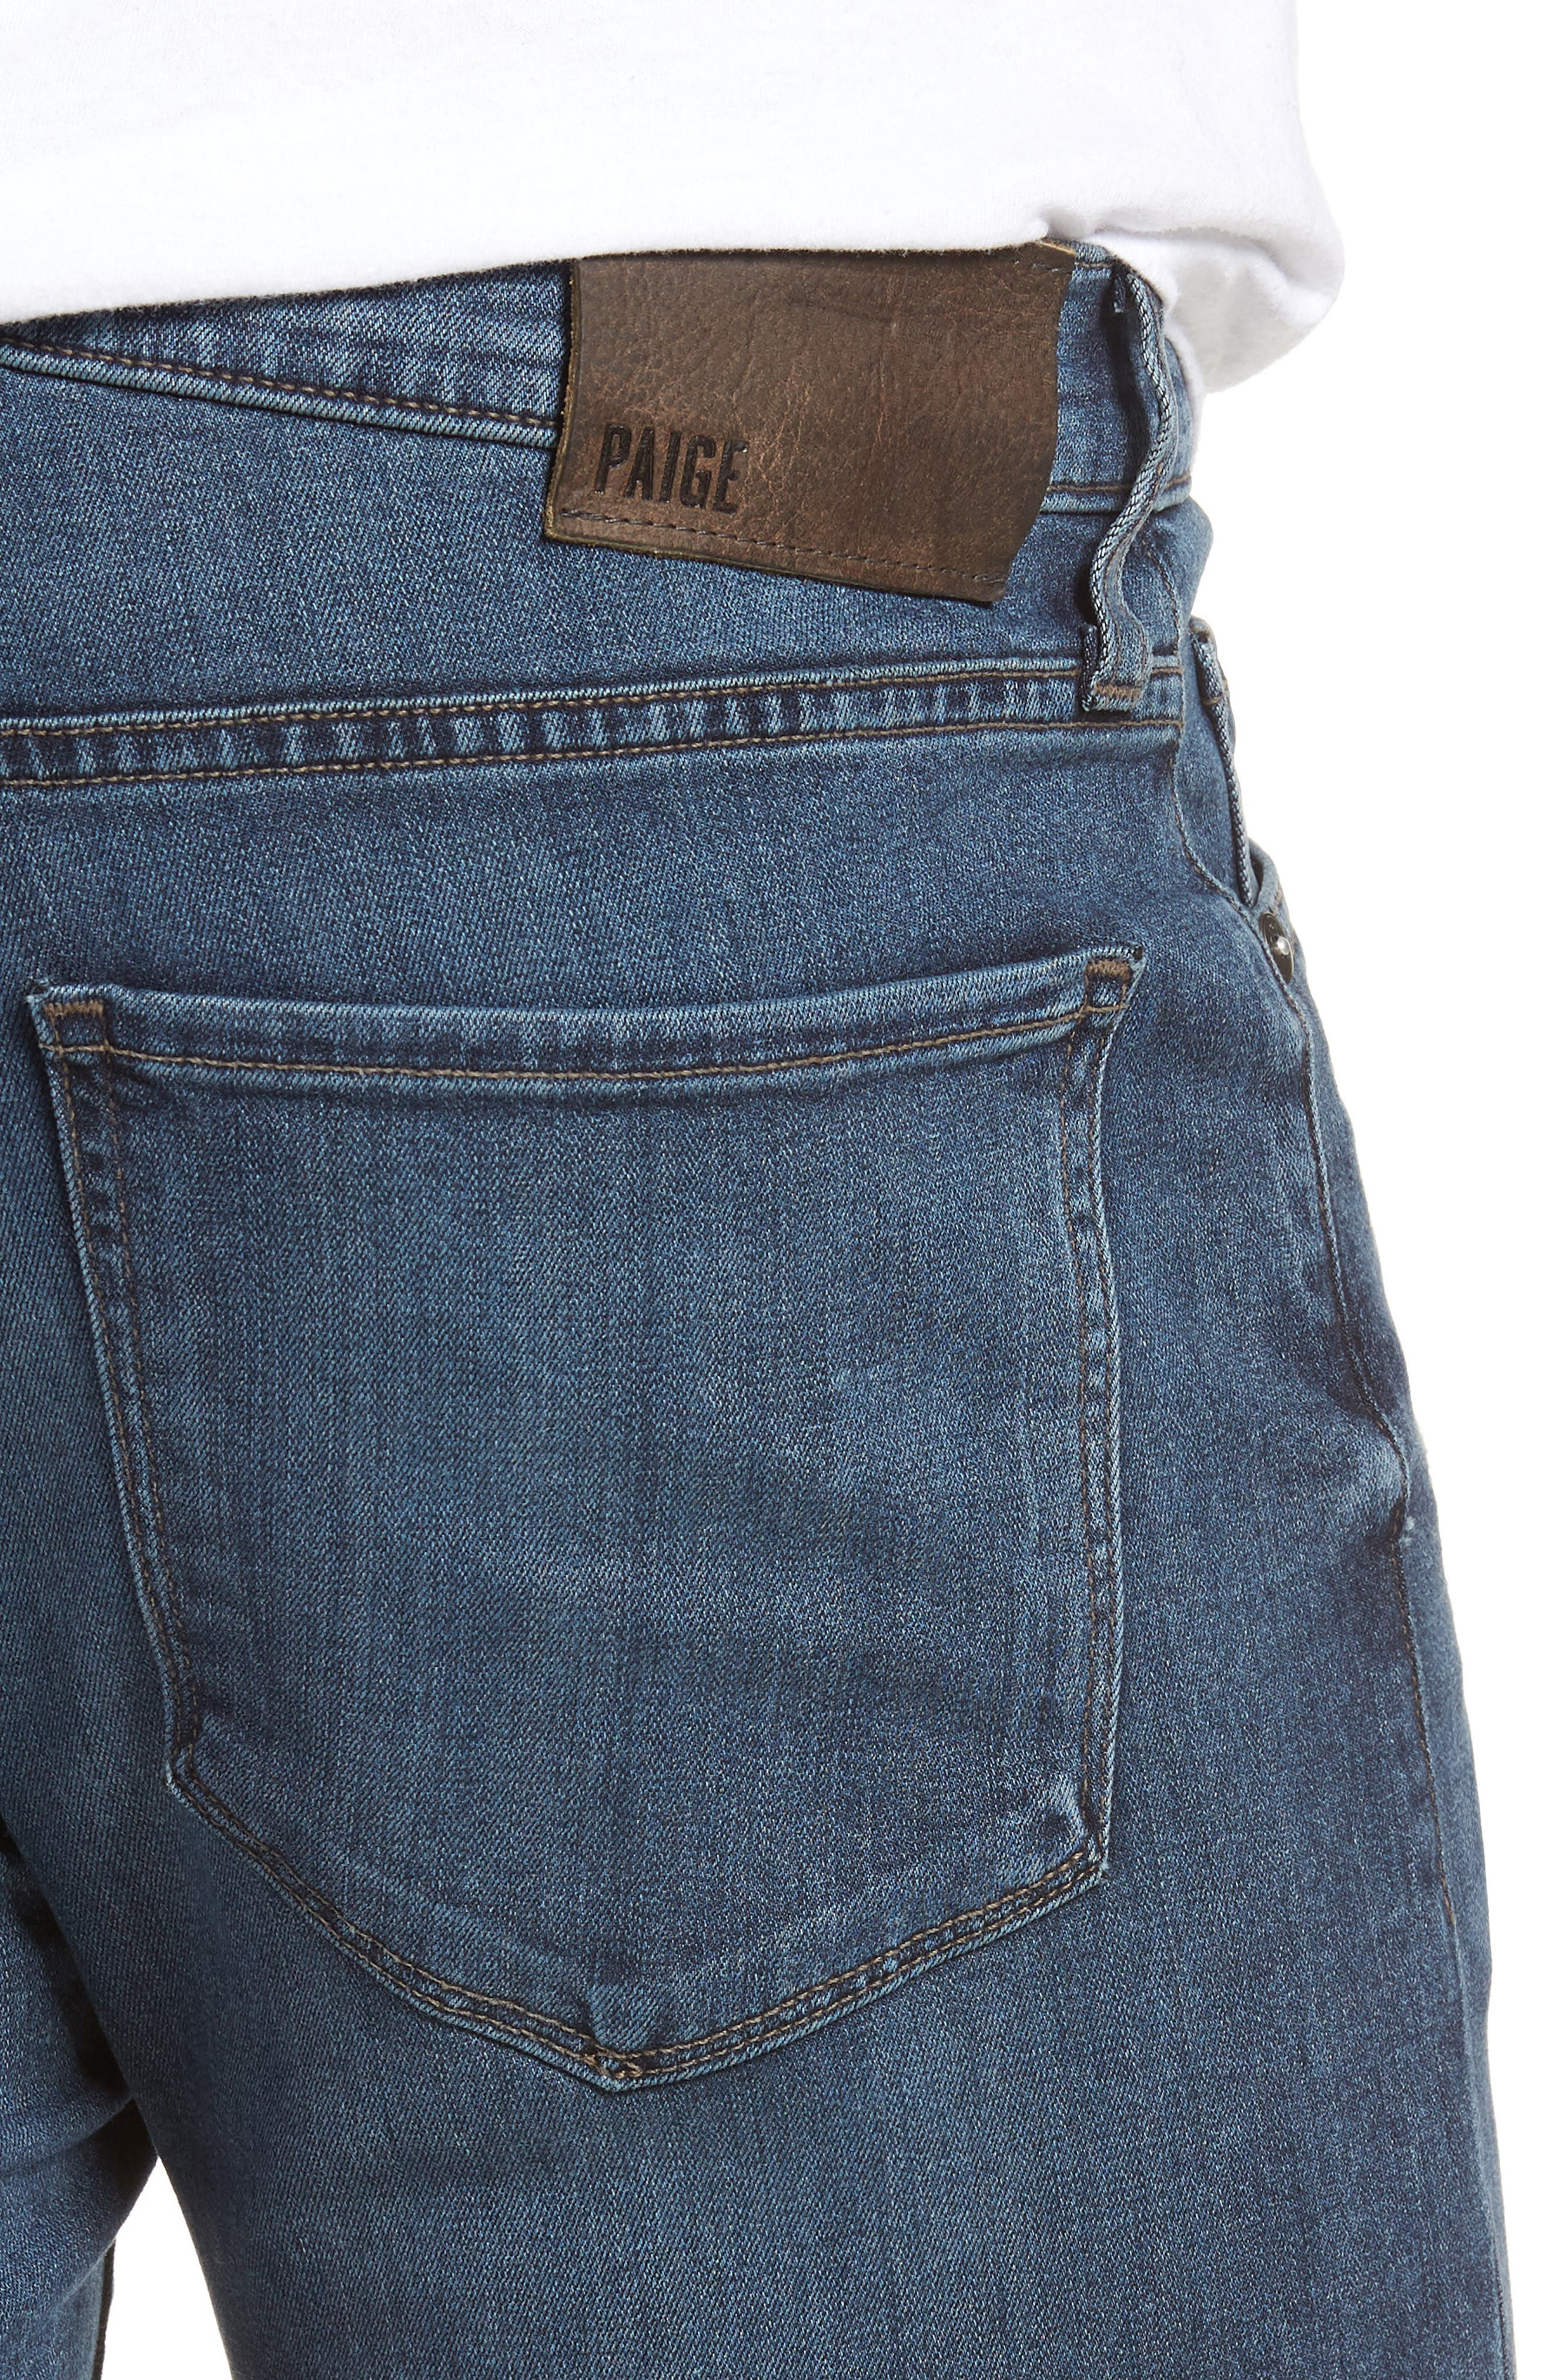 Transcend - Croft Skinny Fit Jeans,                             Alternate thumbnail 4, color,                             Grammercy